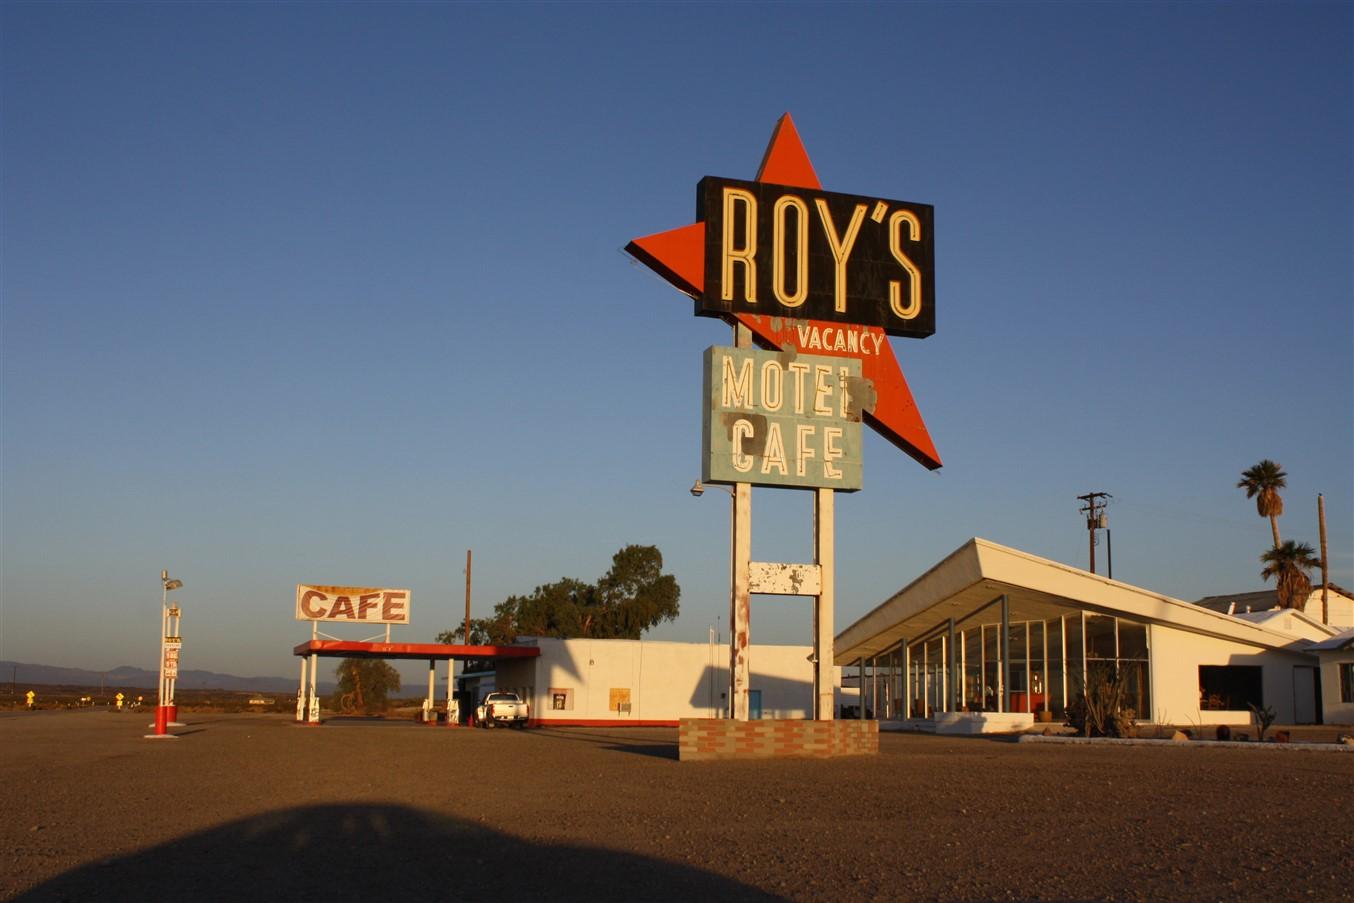 2012 03 14 Route 66 Road Trip 20 California Desert.jpg